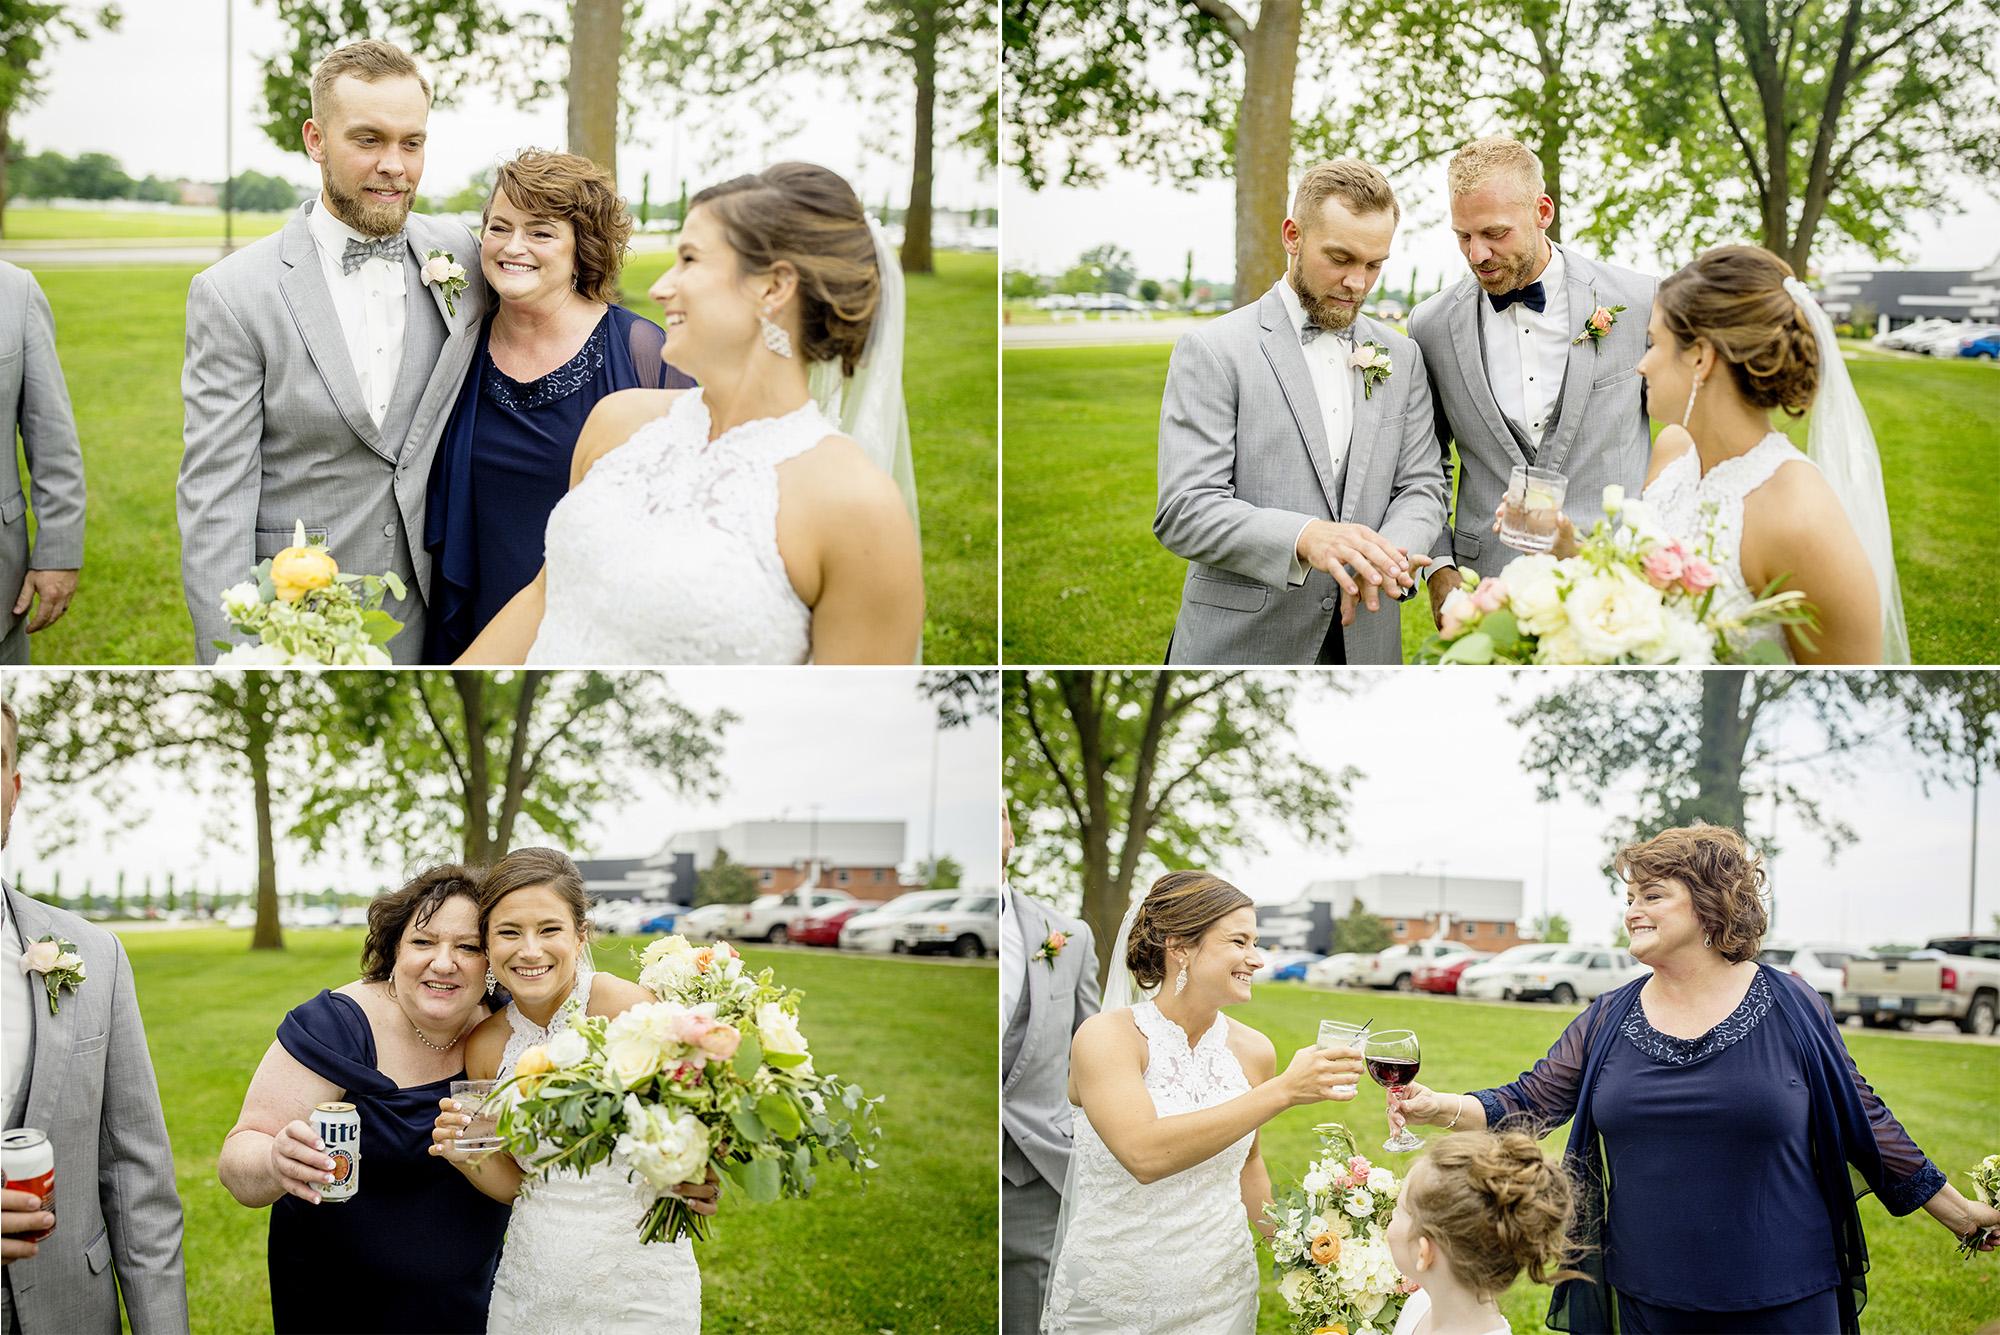 Seriously_Sabrina_Photography_Lexington_Kentucky_Round_Barn_Red_Mile_Stable_of_Memories_Wedding_Hart_78.jpg